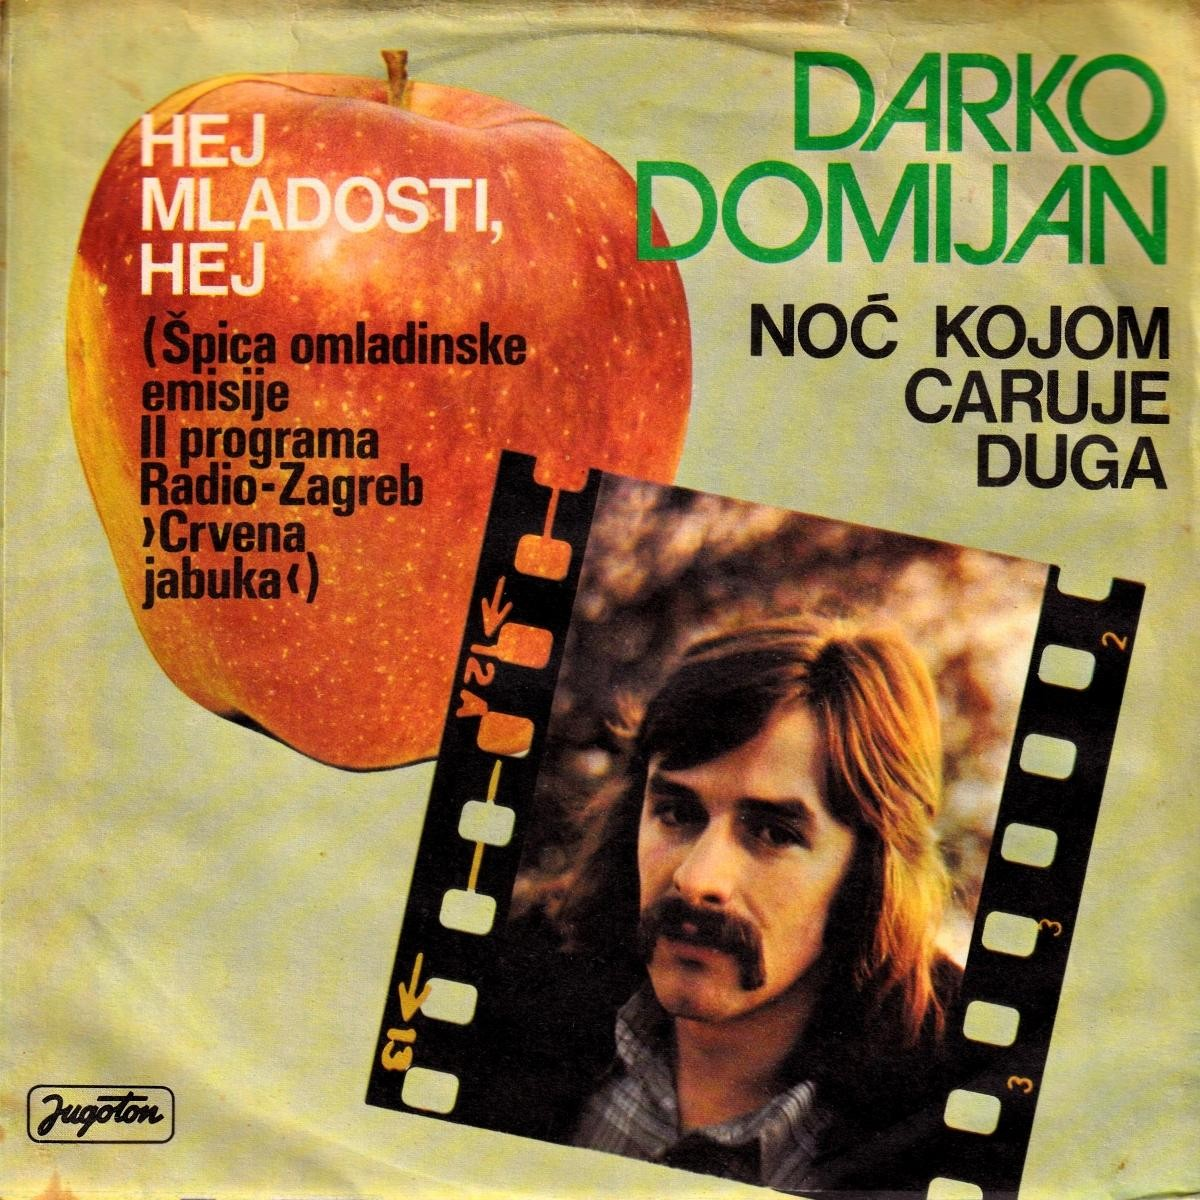 Domijan Darko - Noc Kojim Caruje Duga/hej Mladosti Hej